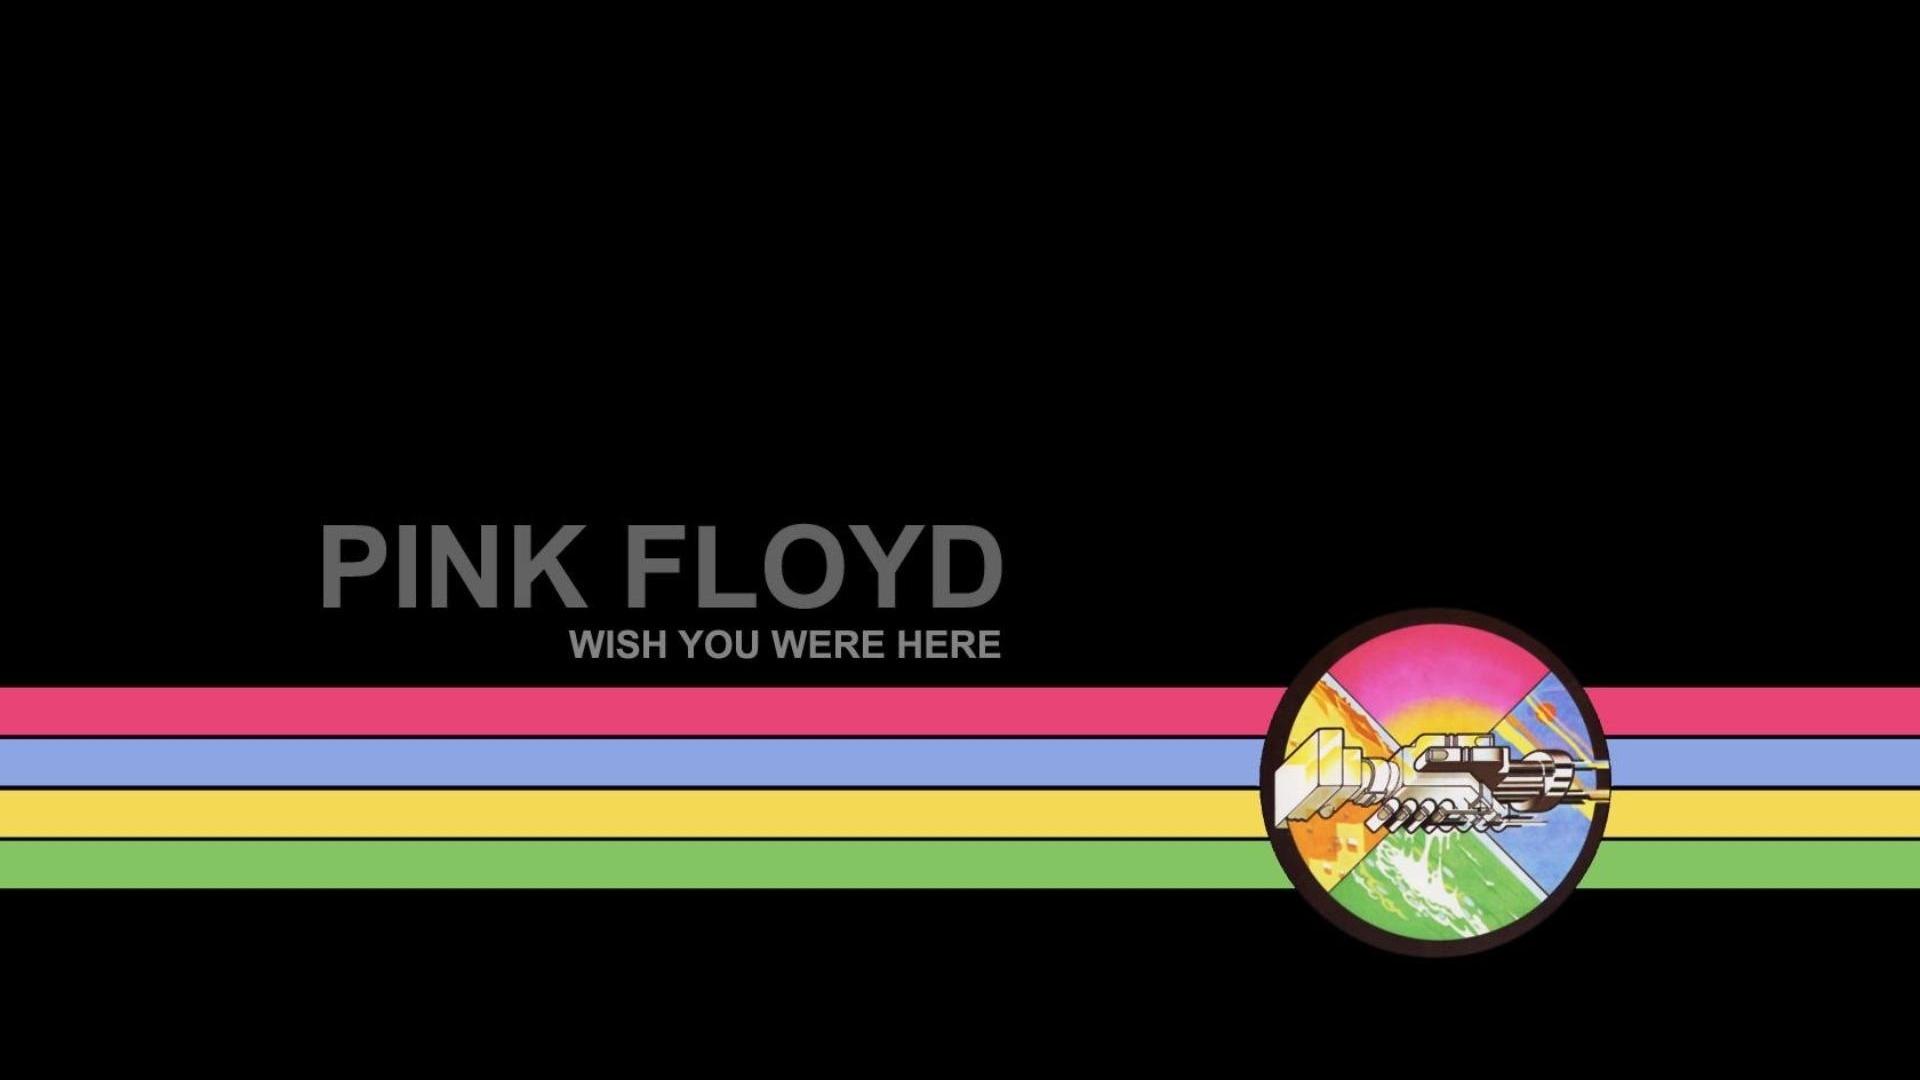 Pink Floyd Wallpaper Hd wallpaper   1109486 1920x1080